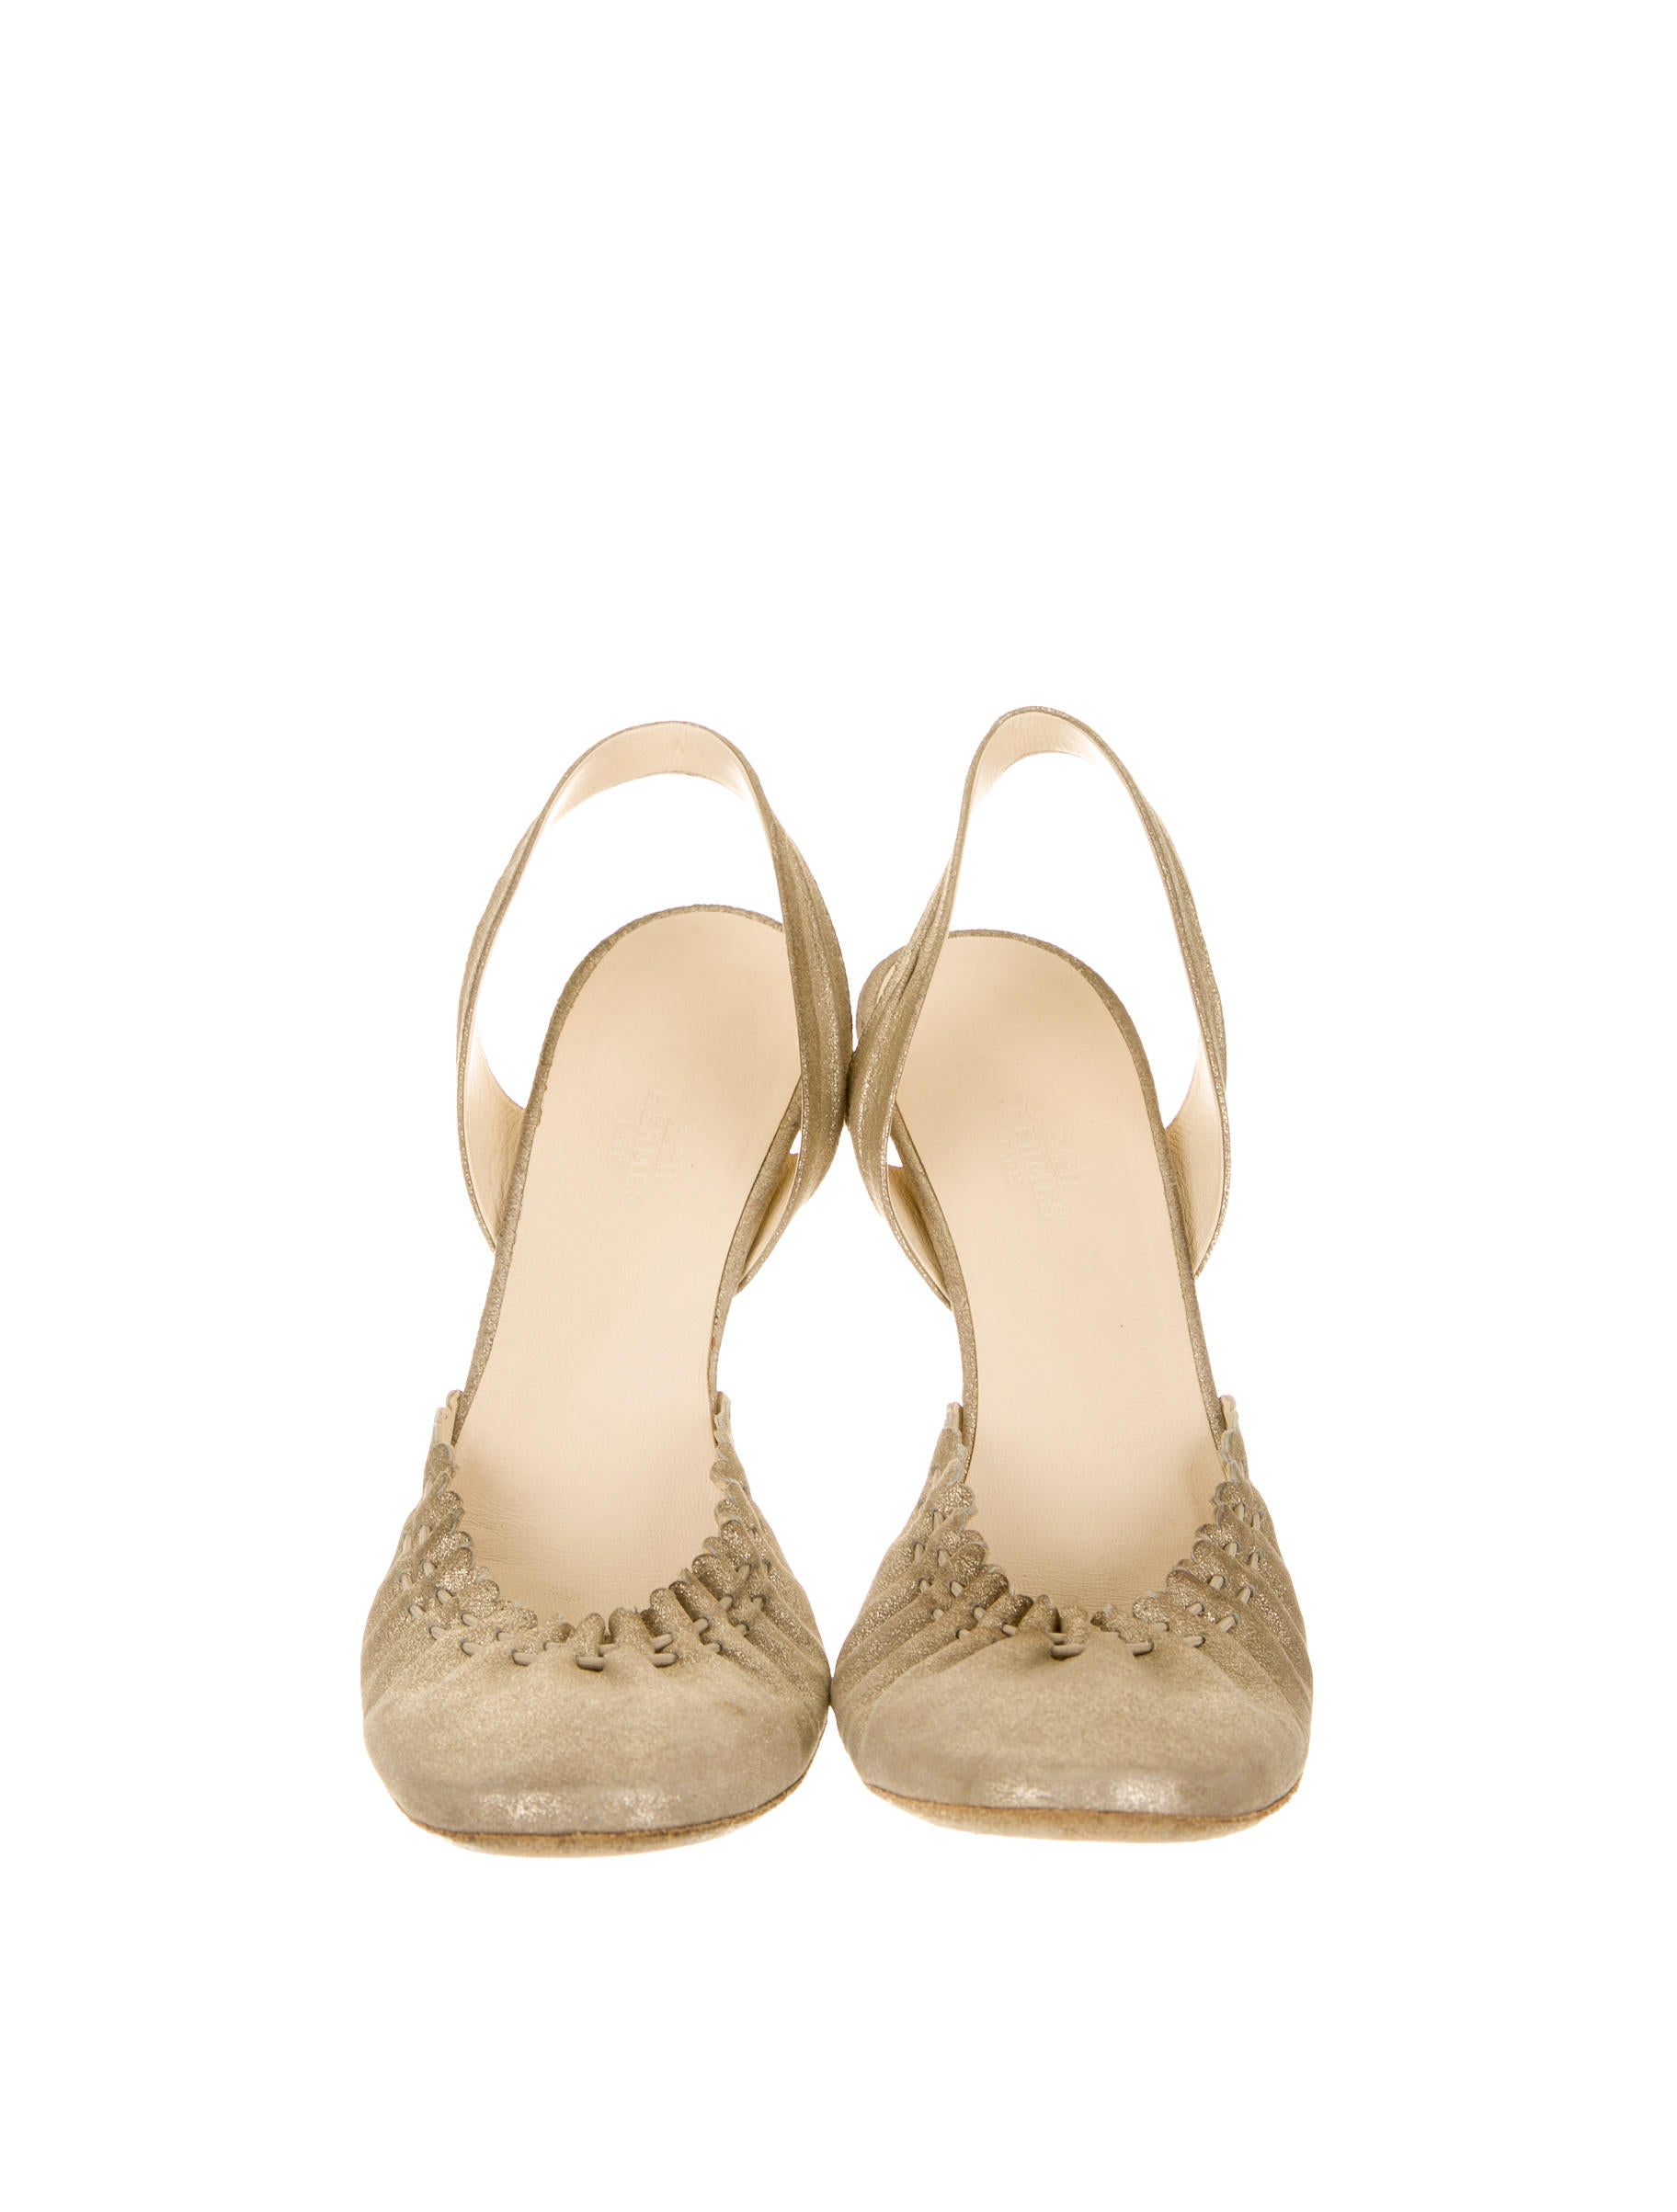 hermes women shoes - photo #14